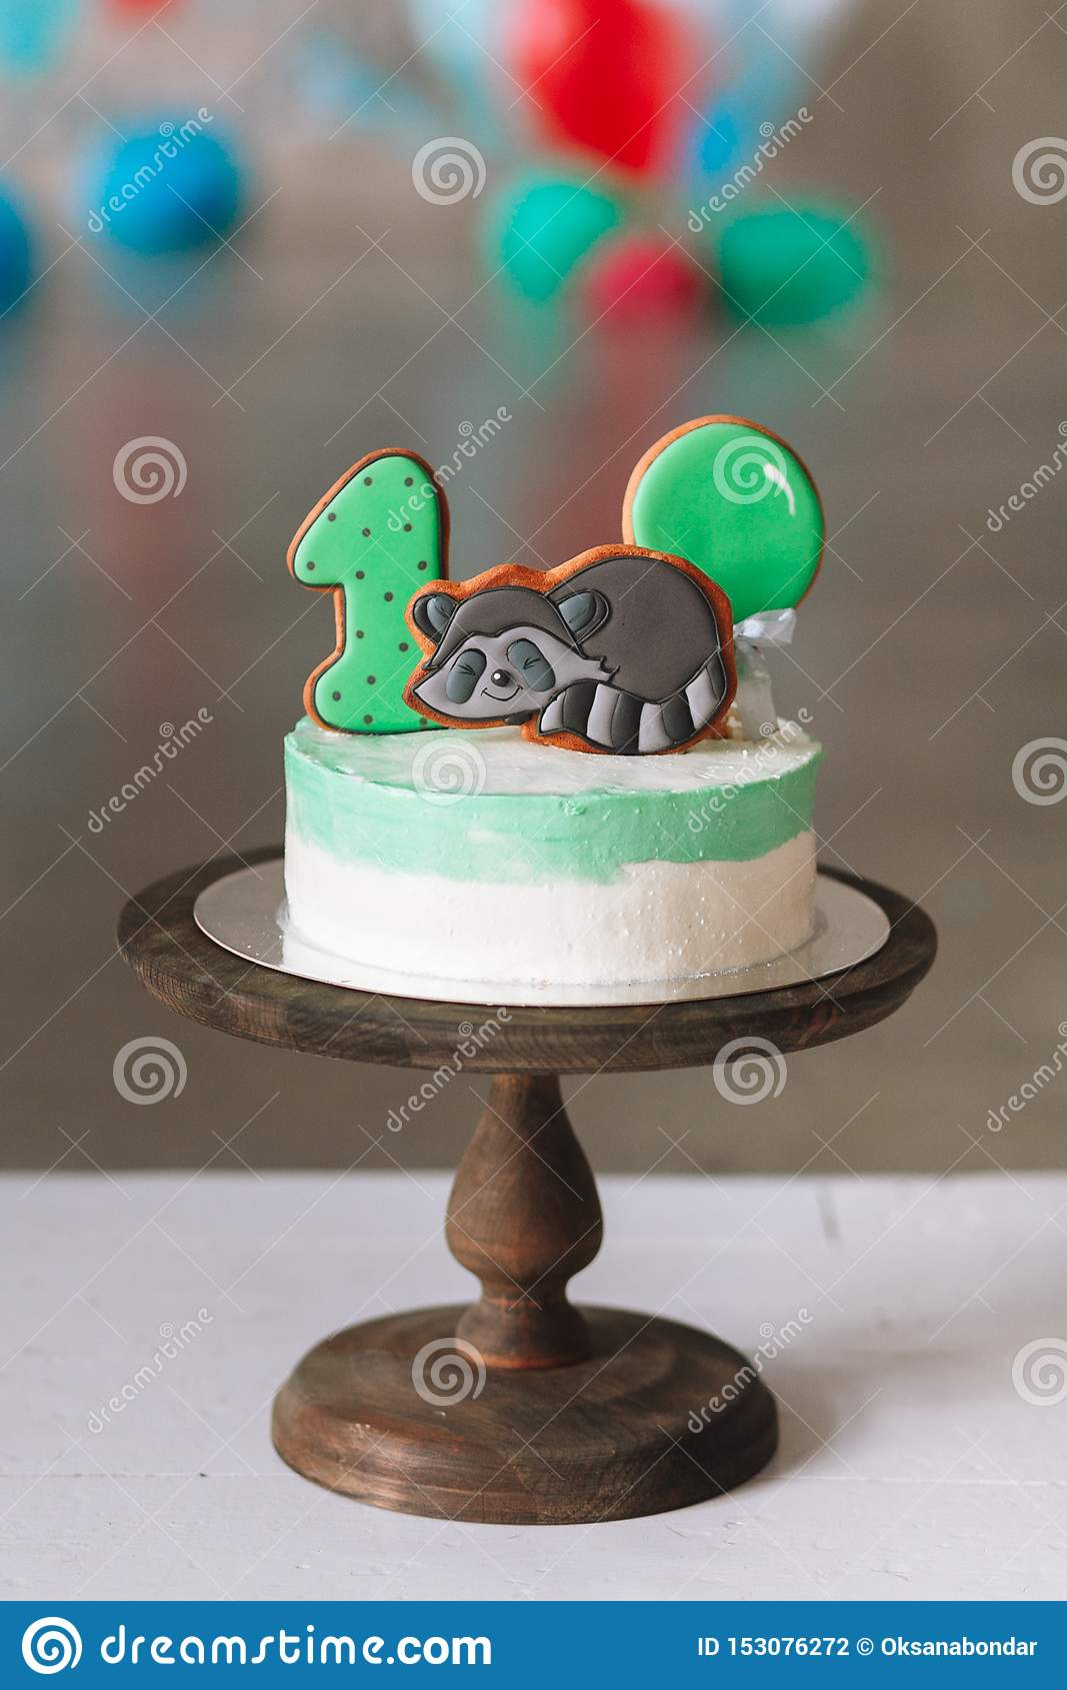 Astounding First Birthday Cake Isolated On White Background Stock Photo Personalised Birthday Cards Petedlily Jamesorg